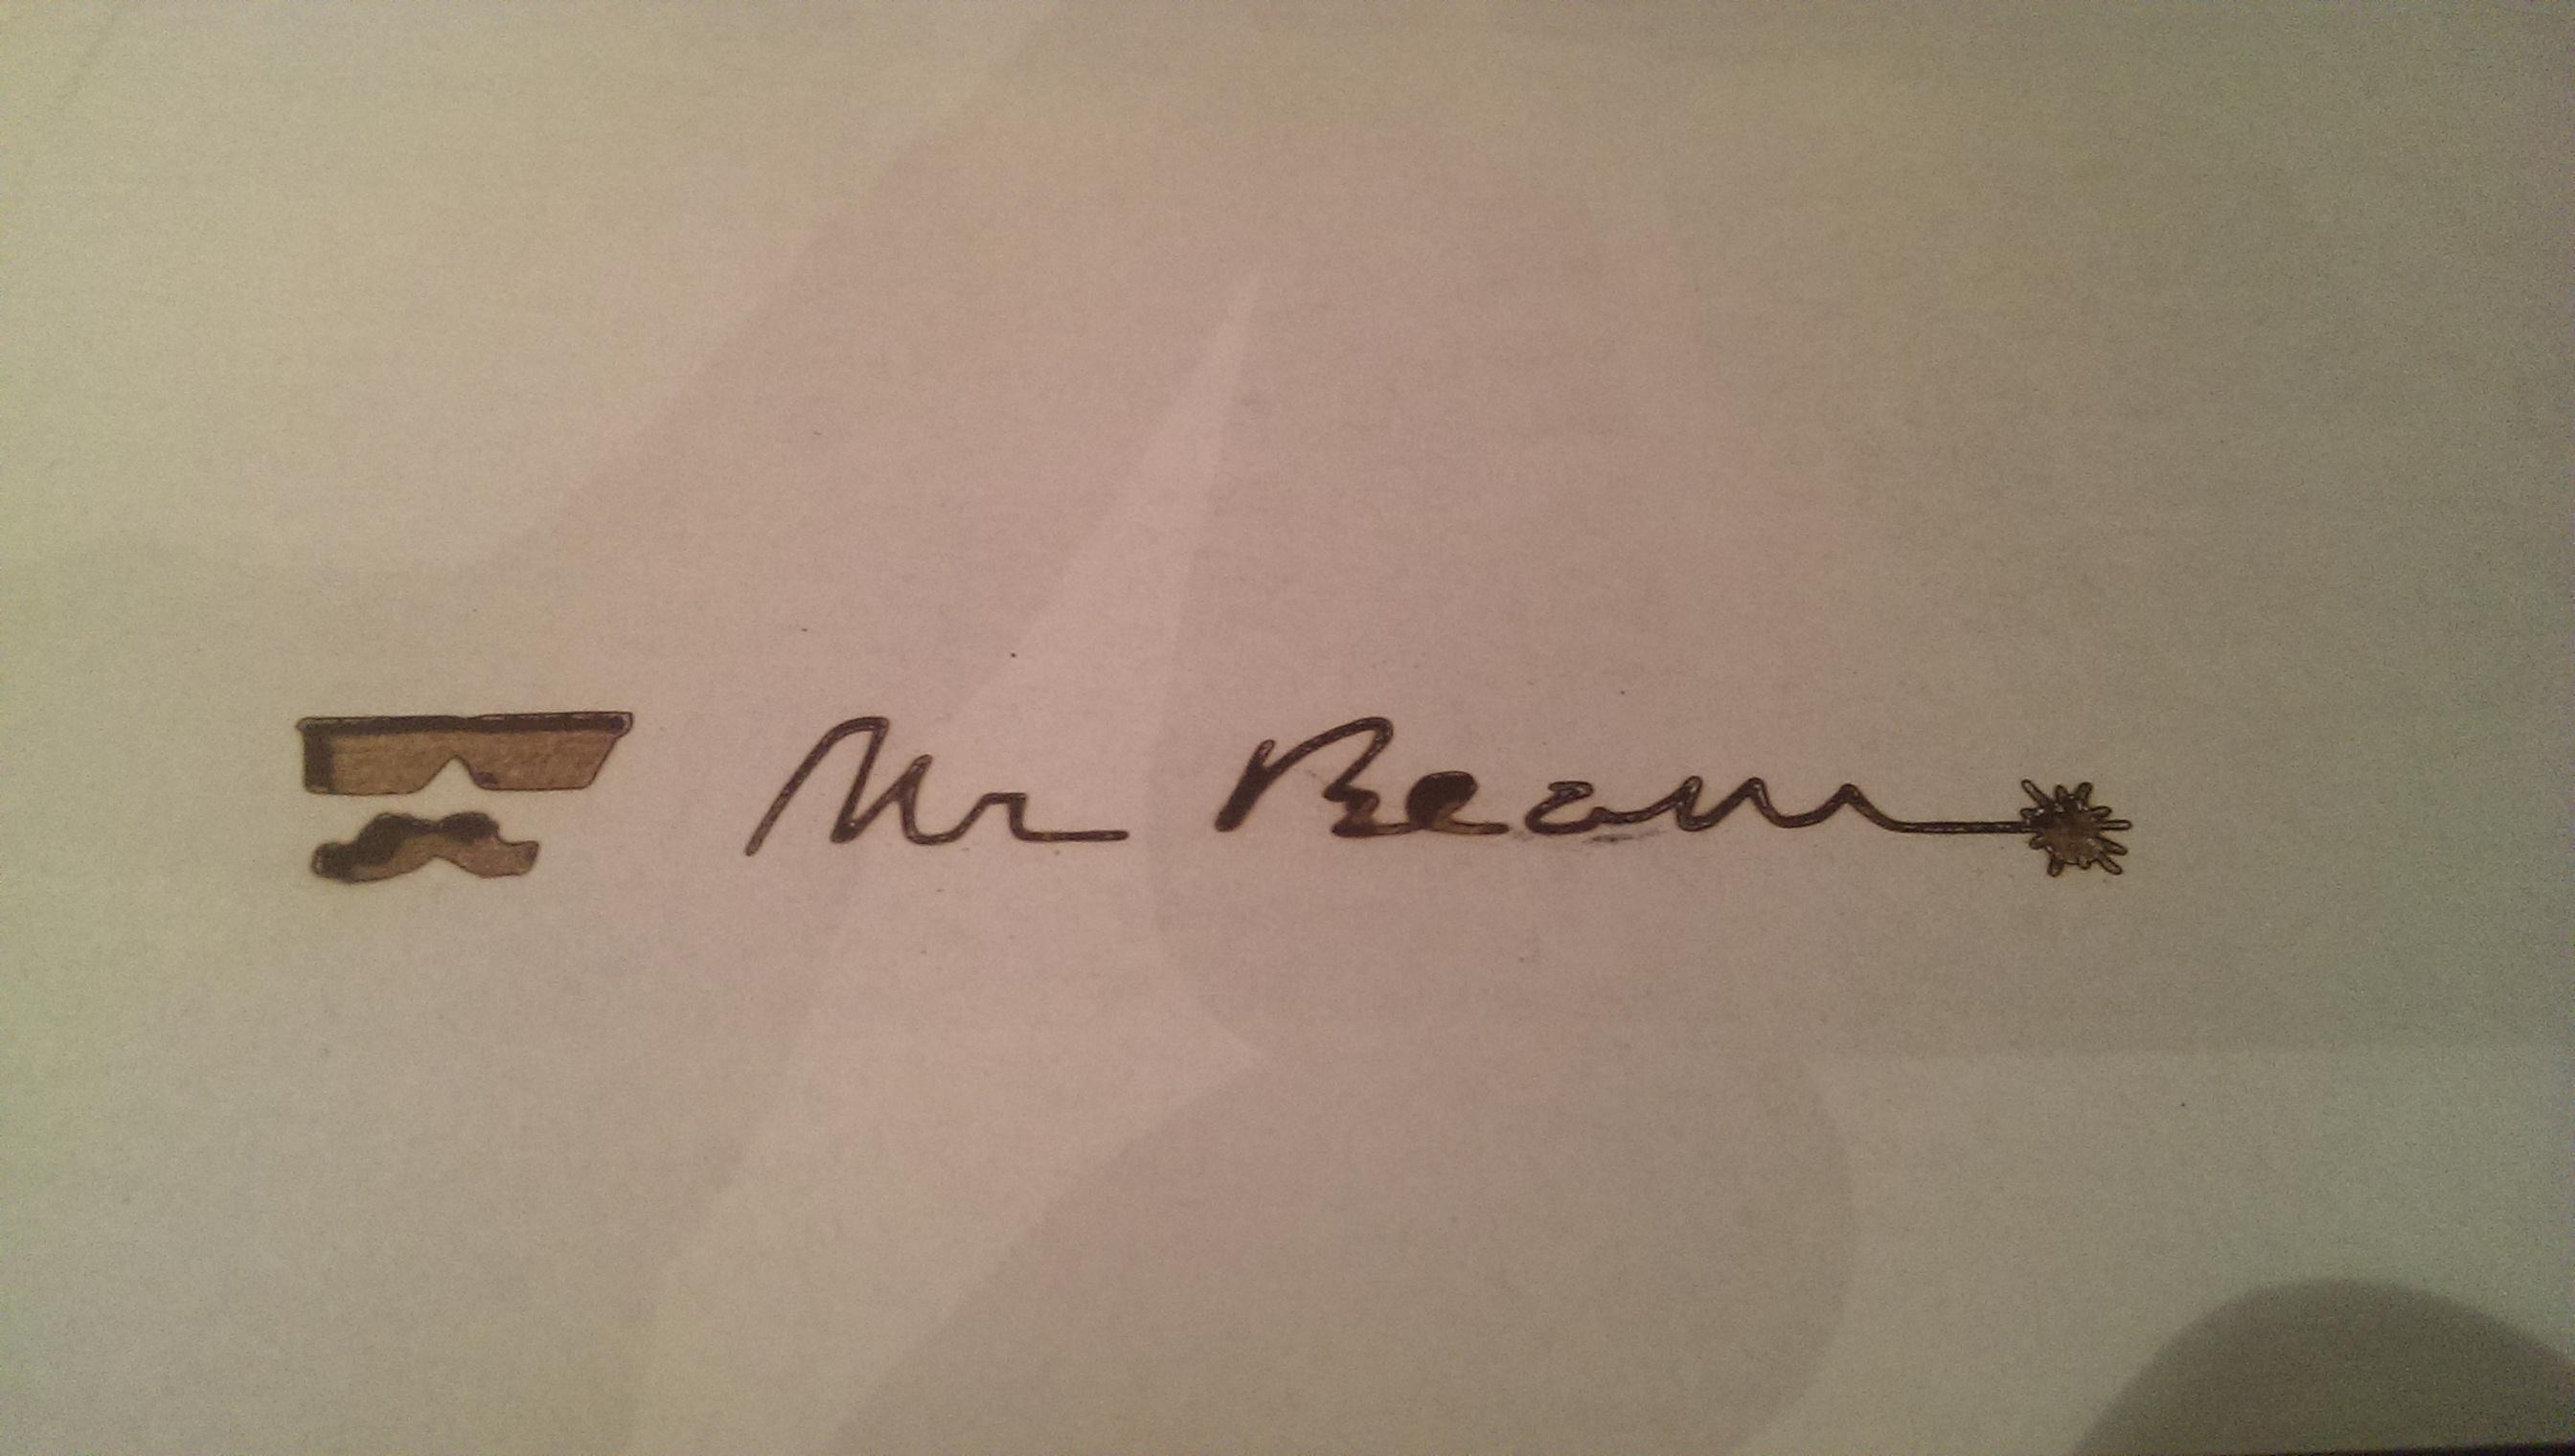 Mr Beam lasered